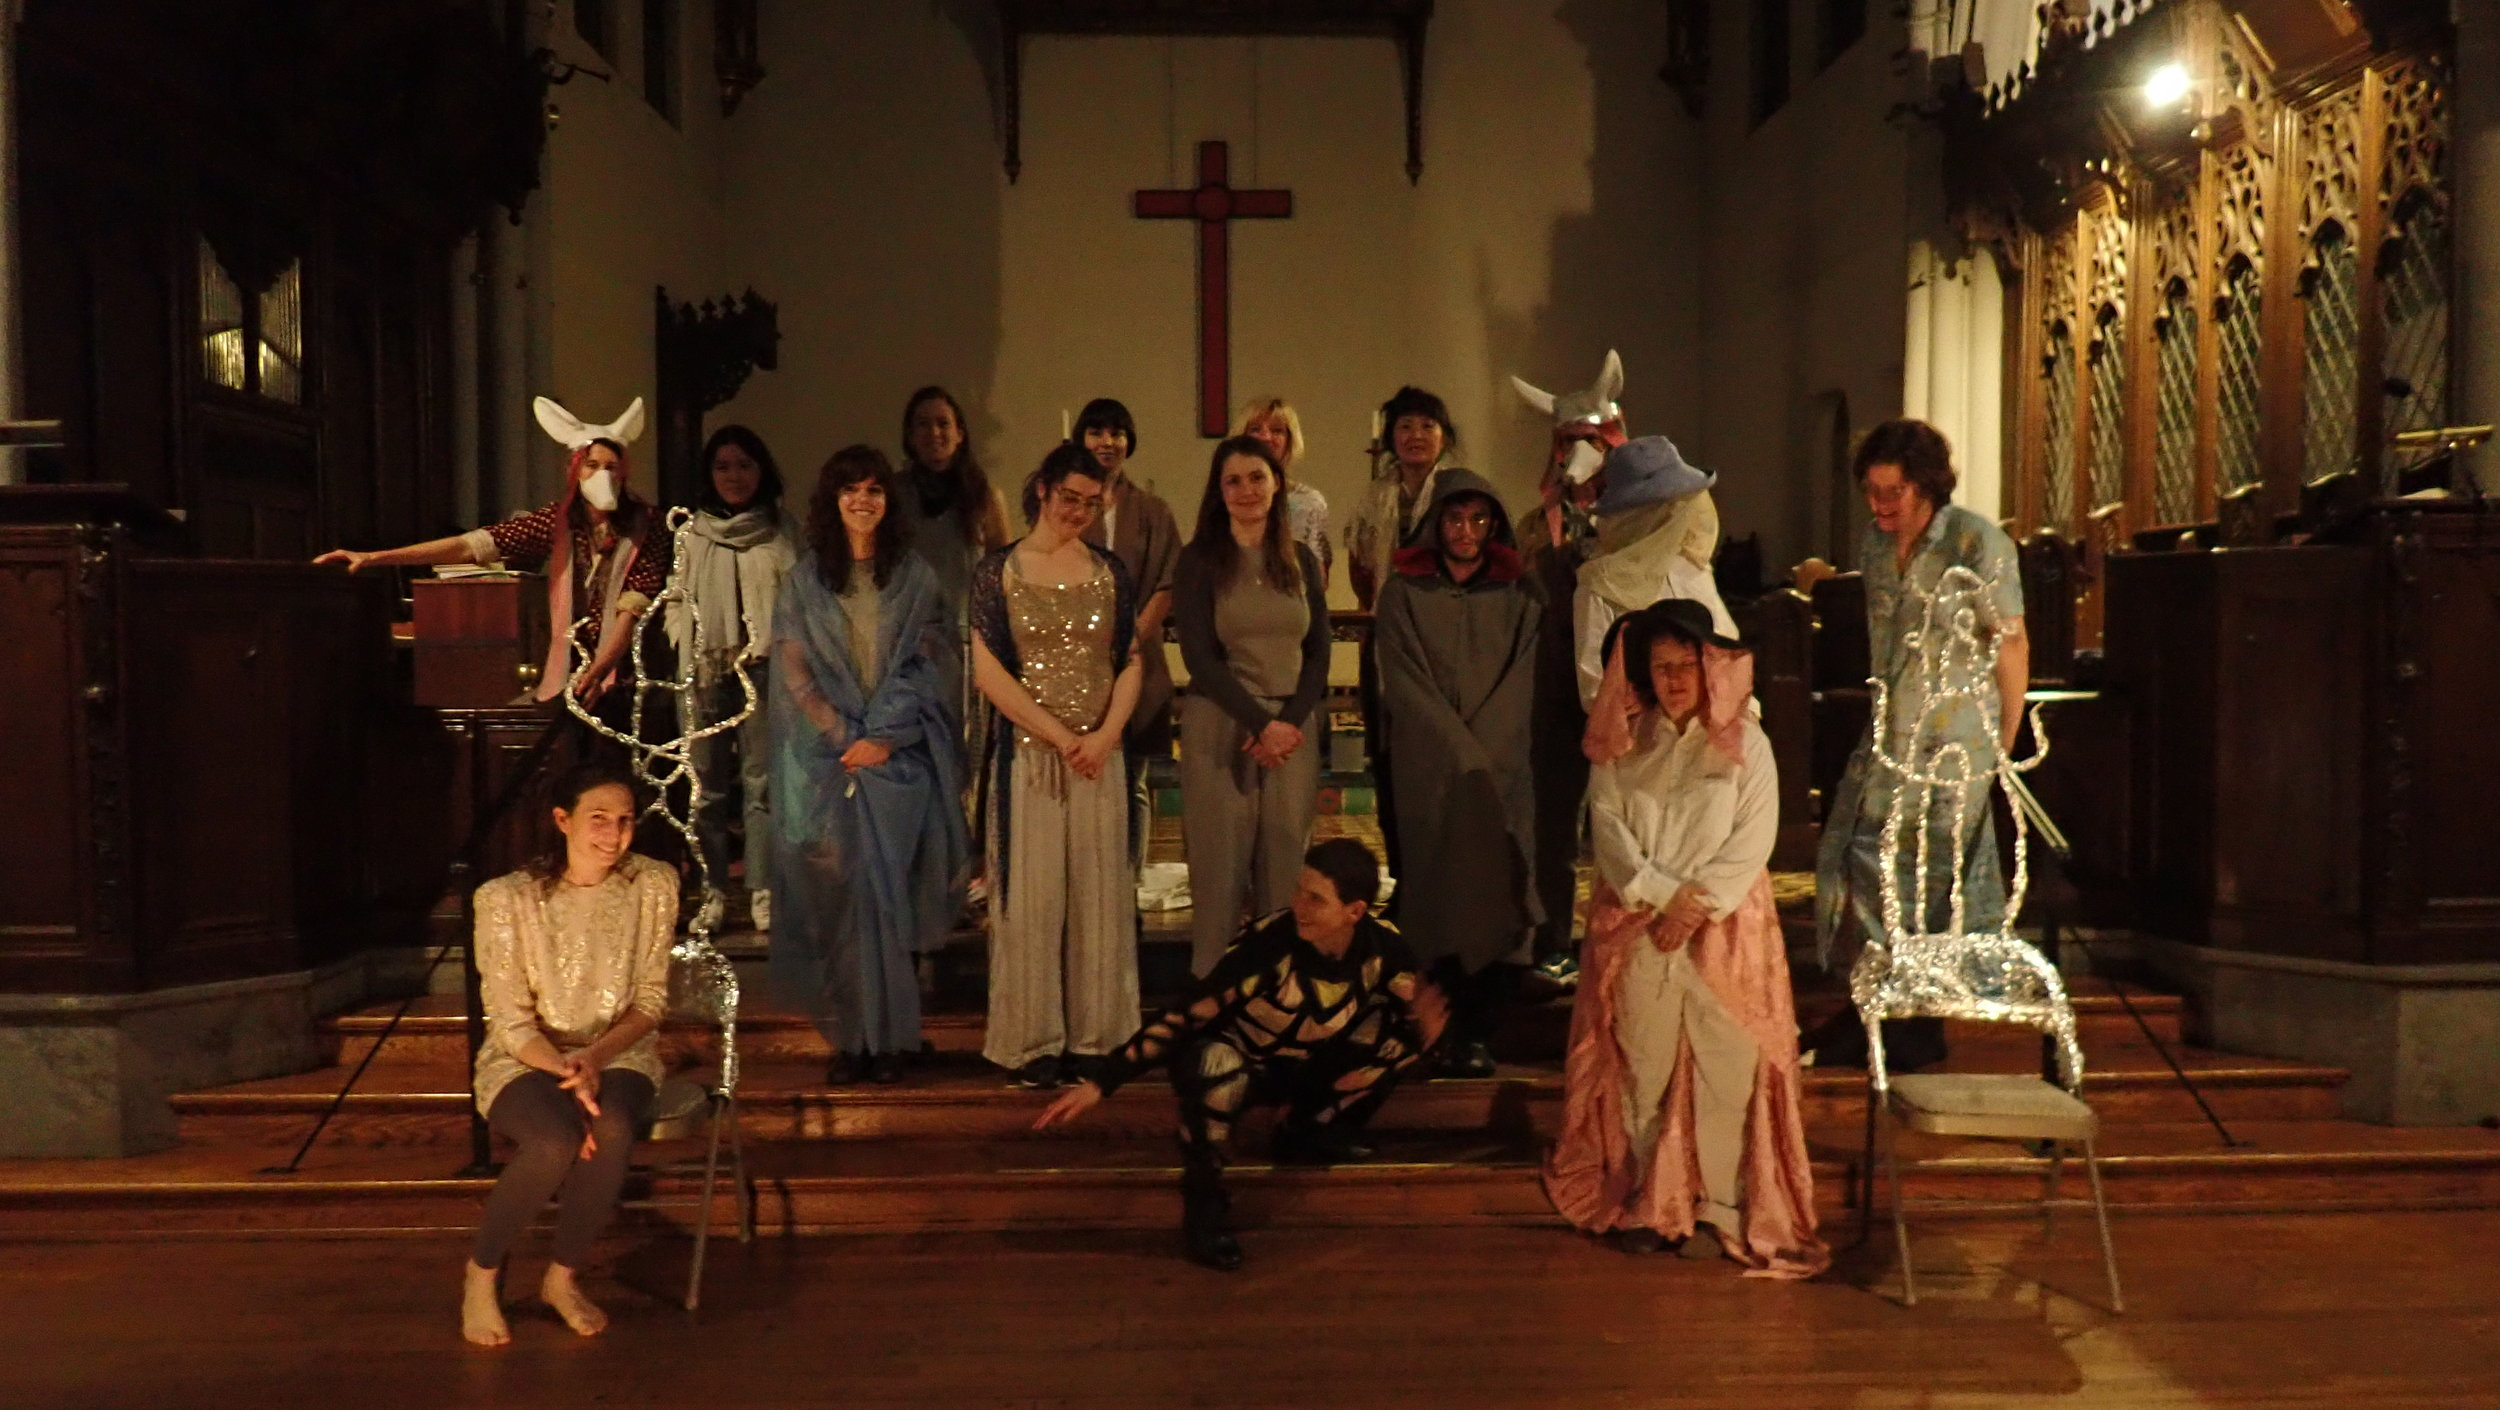 Sunday, 4/7/19 - singer in the Fog Choir in HELEN RIDES IV, by Amanda Friedman. All Saints Episcopal Church, NY